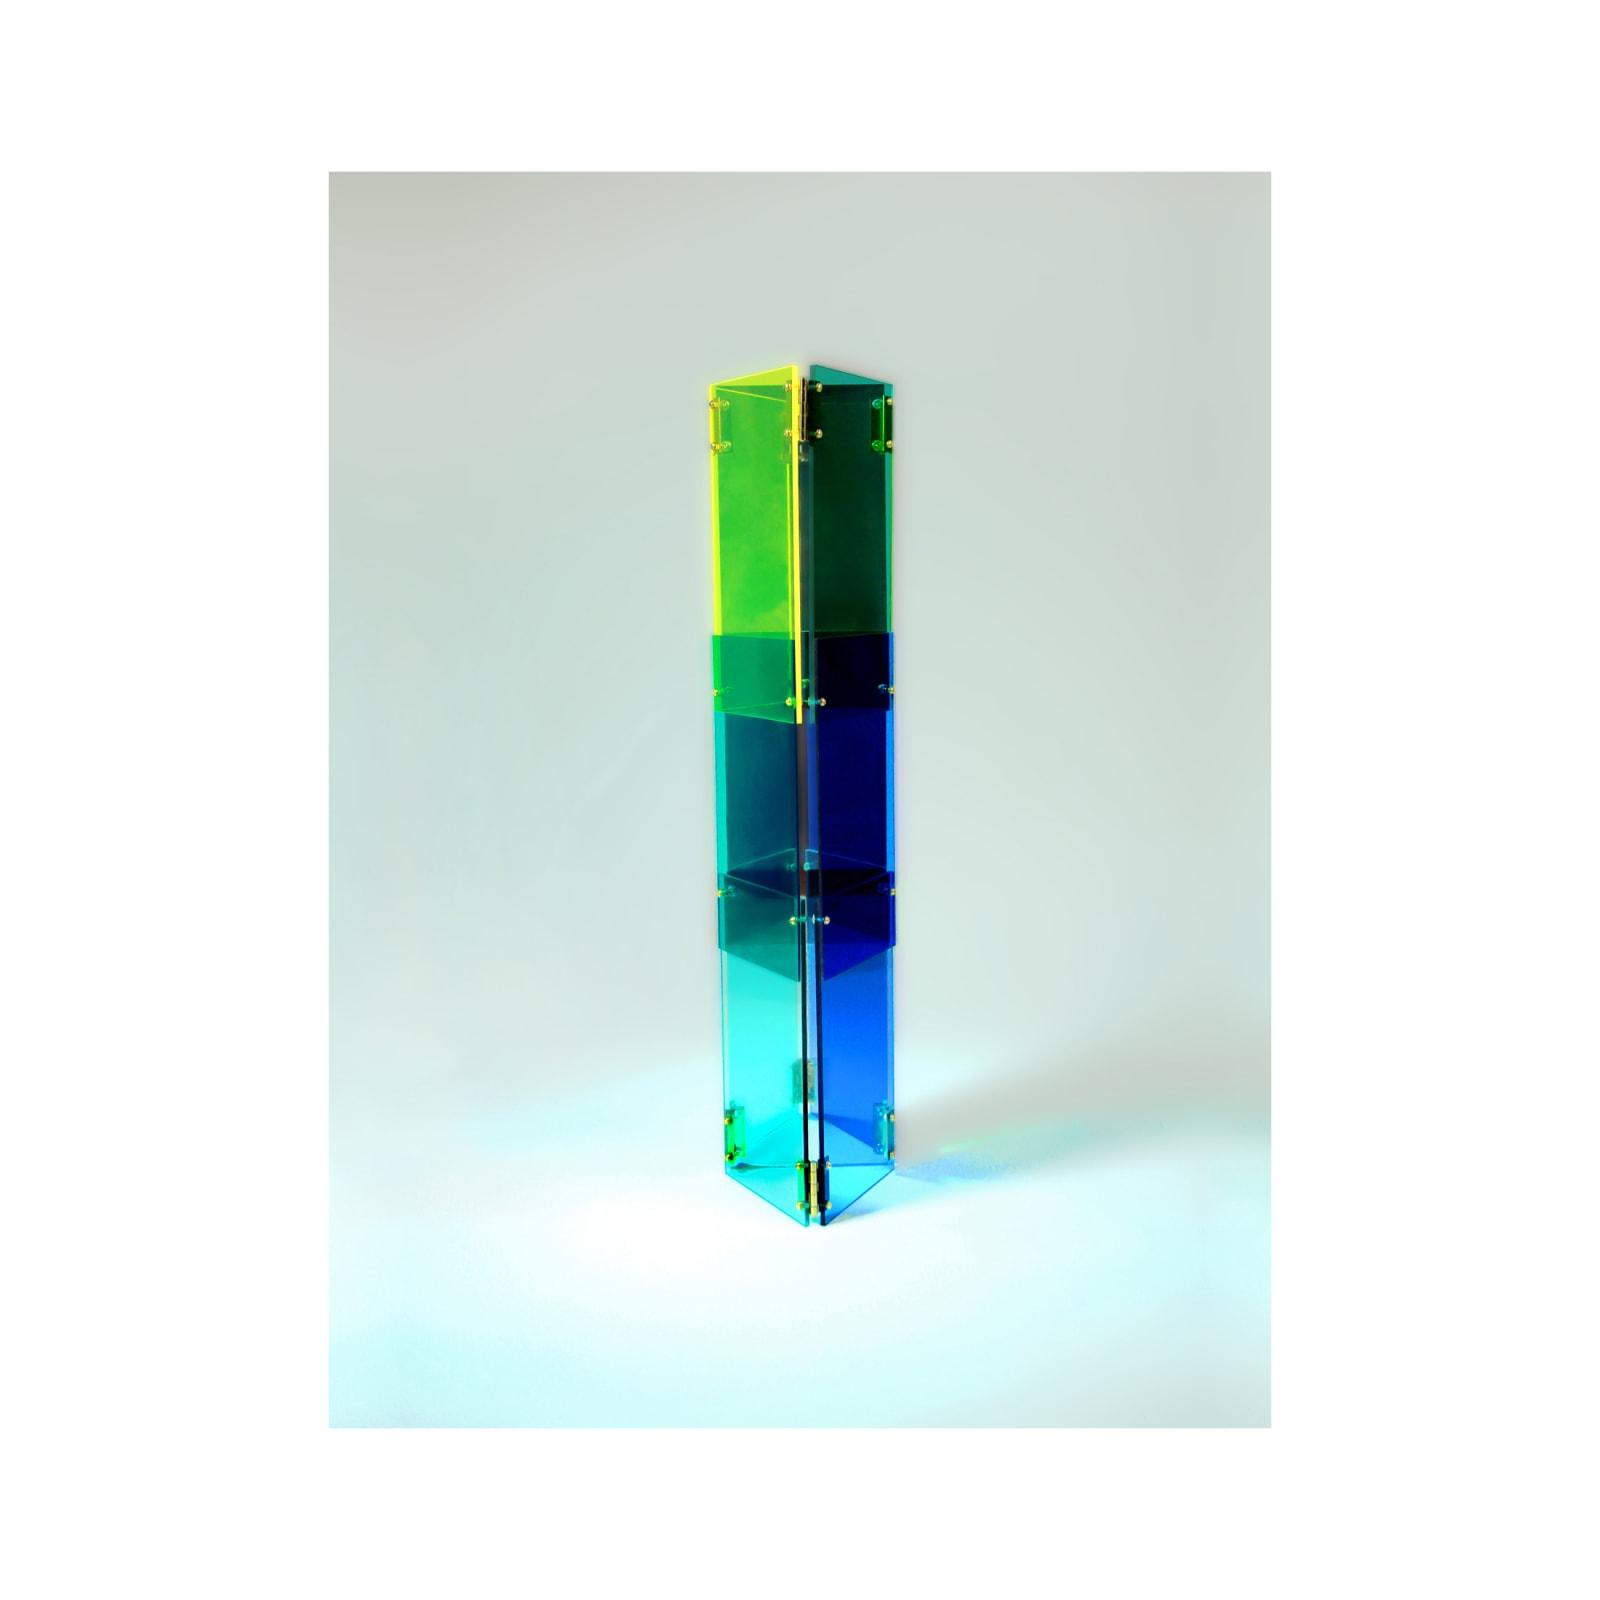 Anne Katrine Senstad  Babel 02, 2020  Lucite/Plexiglas, mirrors, brass door hinges, brass screws, bolts and washers  30 x 7 x 8 in  76.2 x 17.8 x 20.3 cm  Series: Circle of Babel